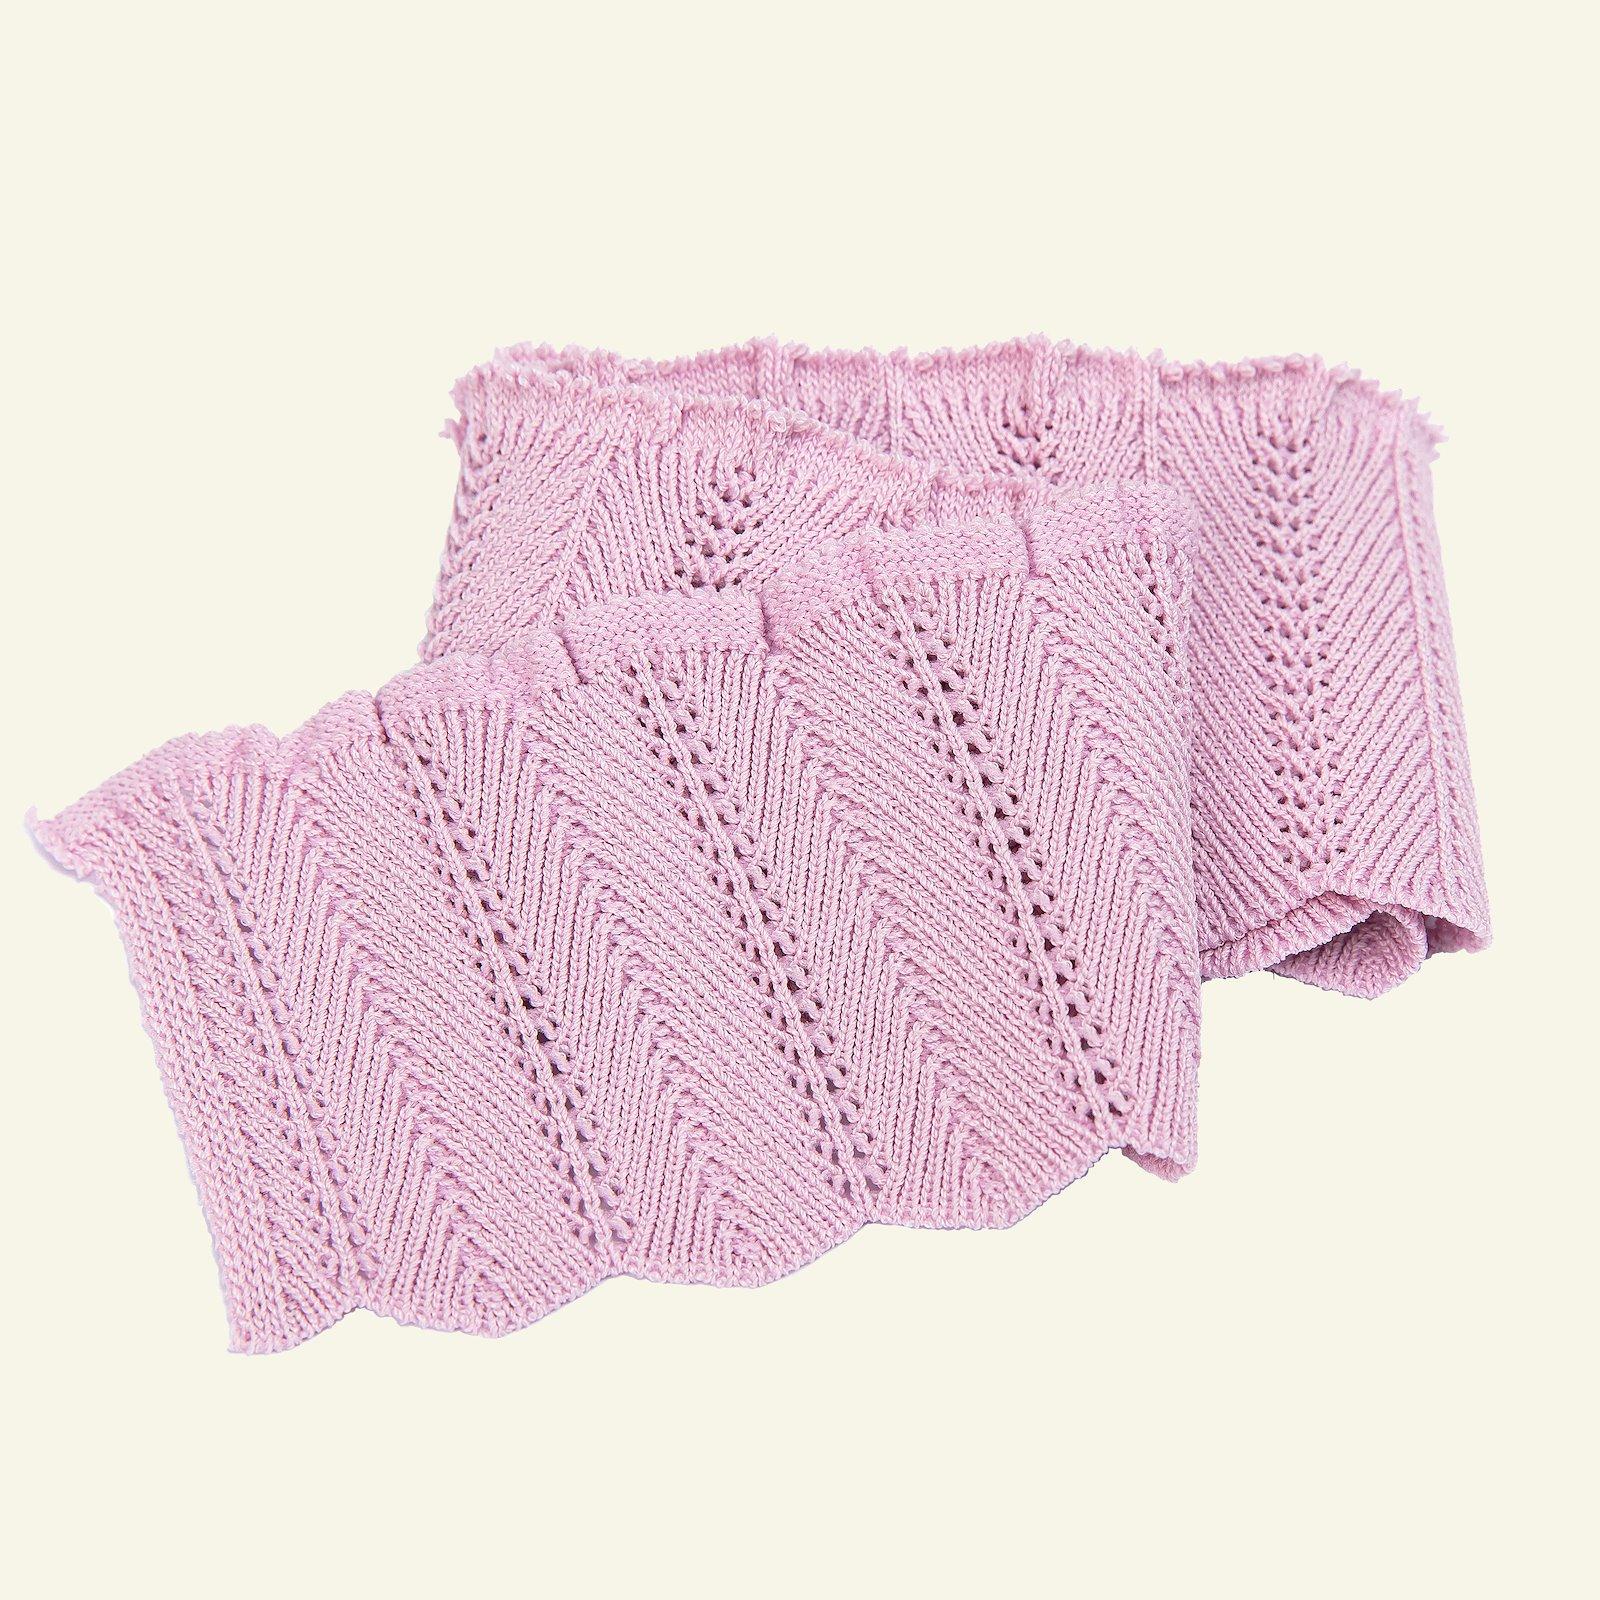 Rib knitted 6x55cm purple 1pc 96138_pack